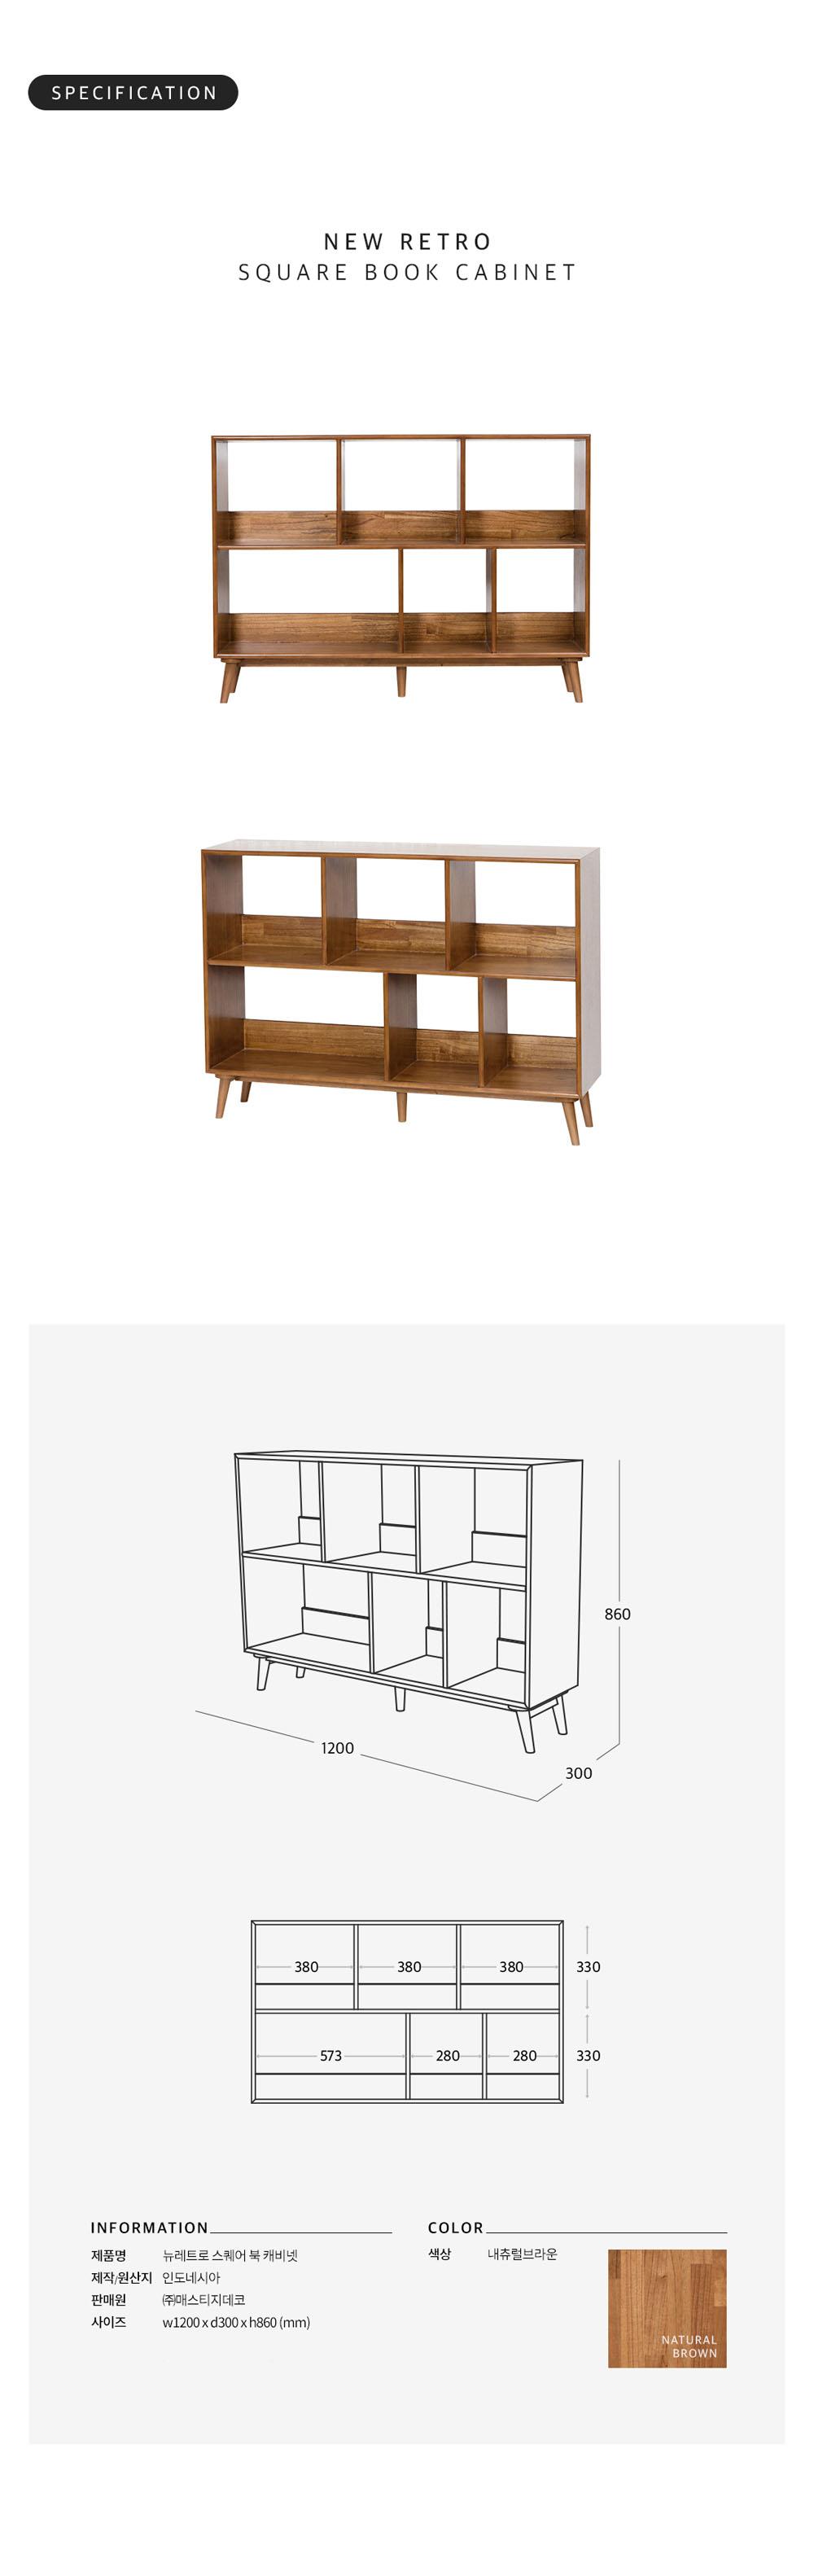 New_Retro_Square_Book_Shelf_Furniture_Online_Specification_1_Singapore_by_born_in_colour